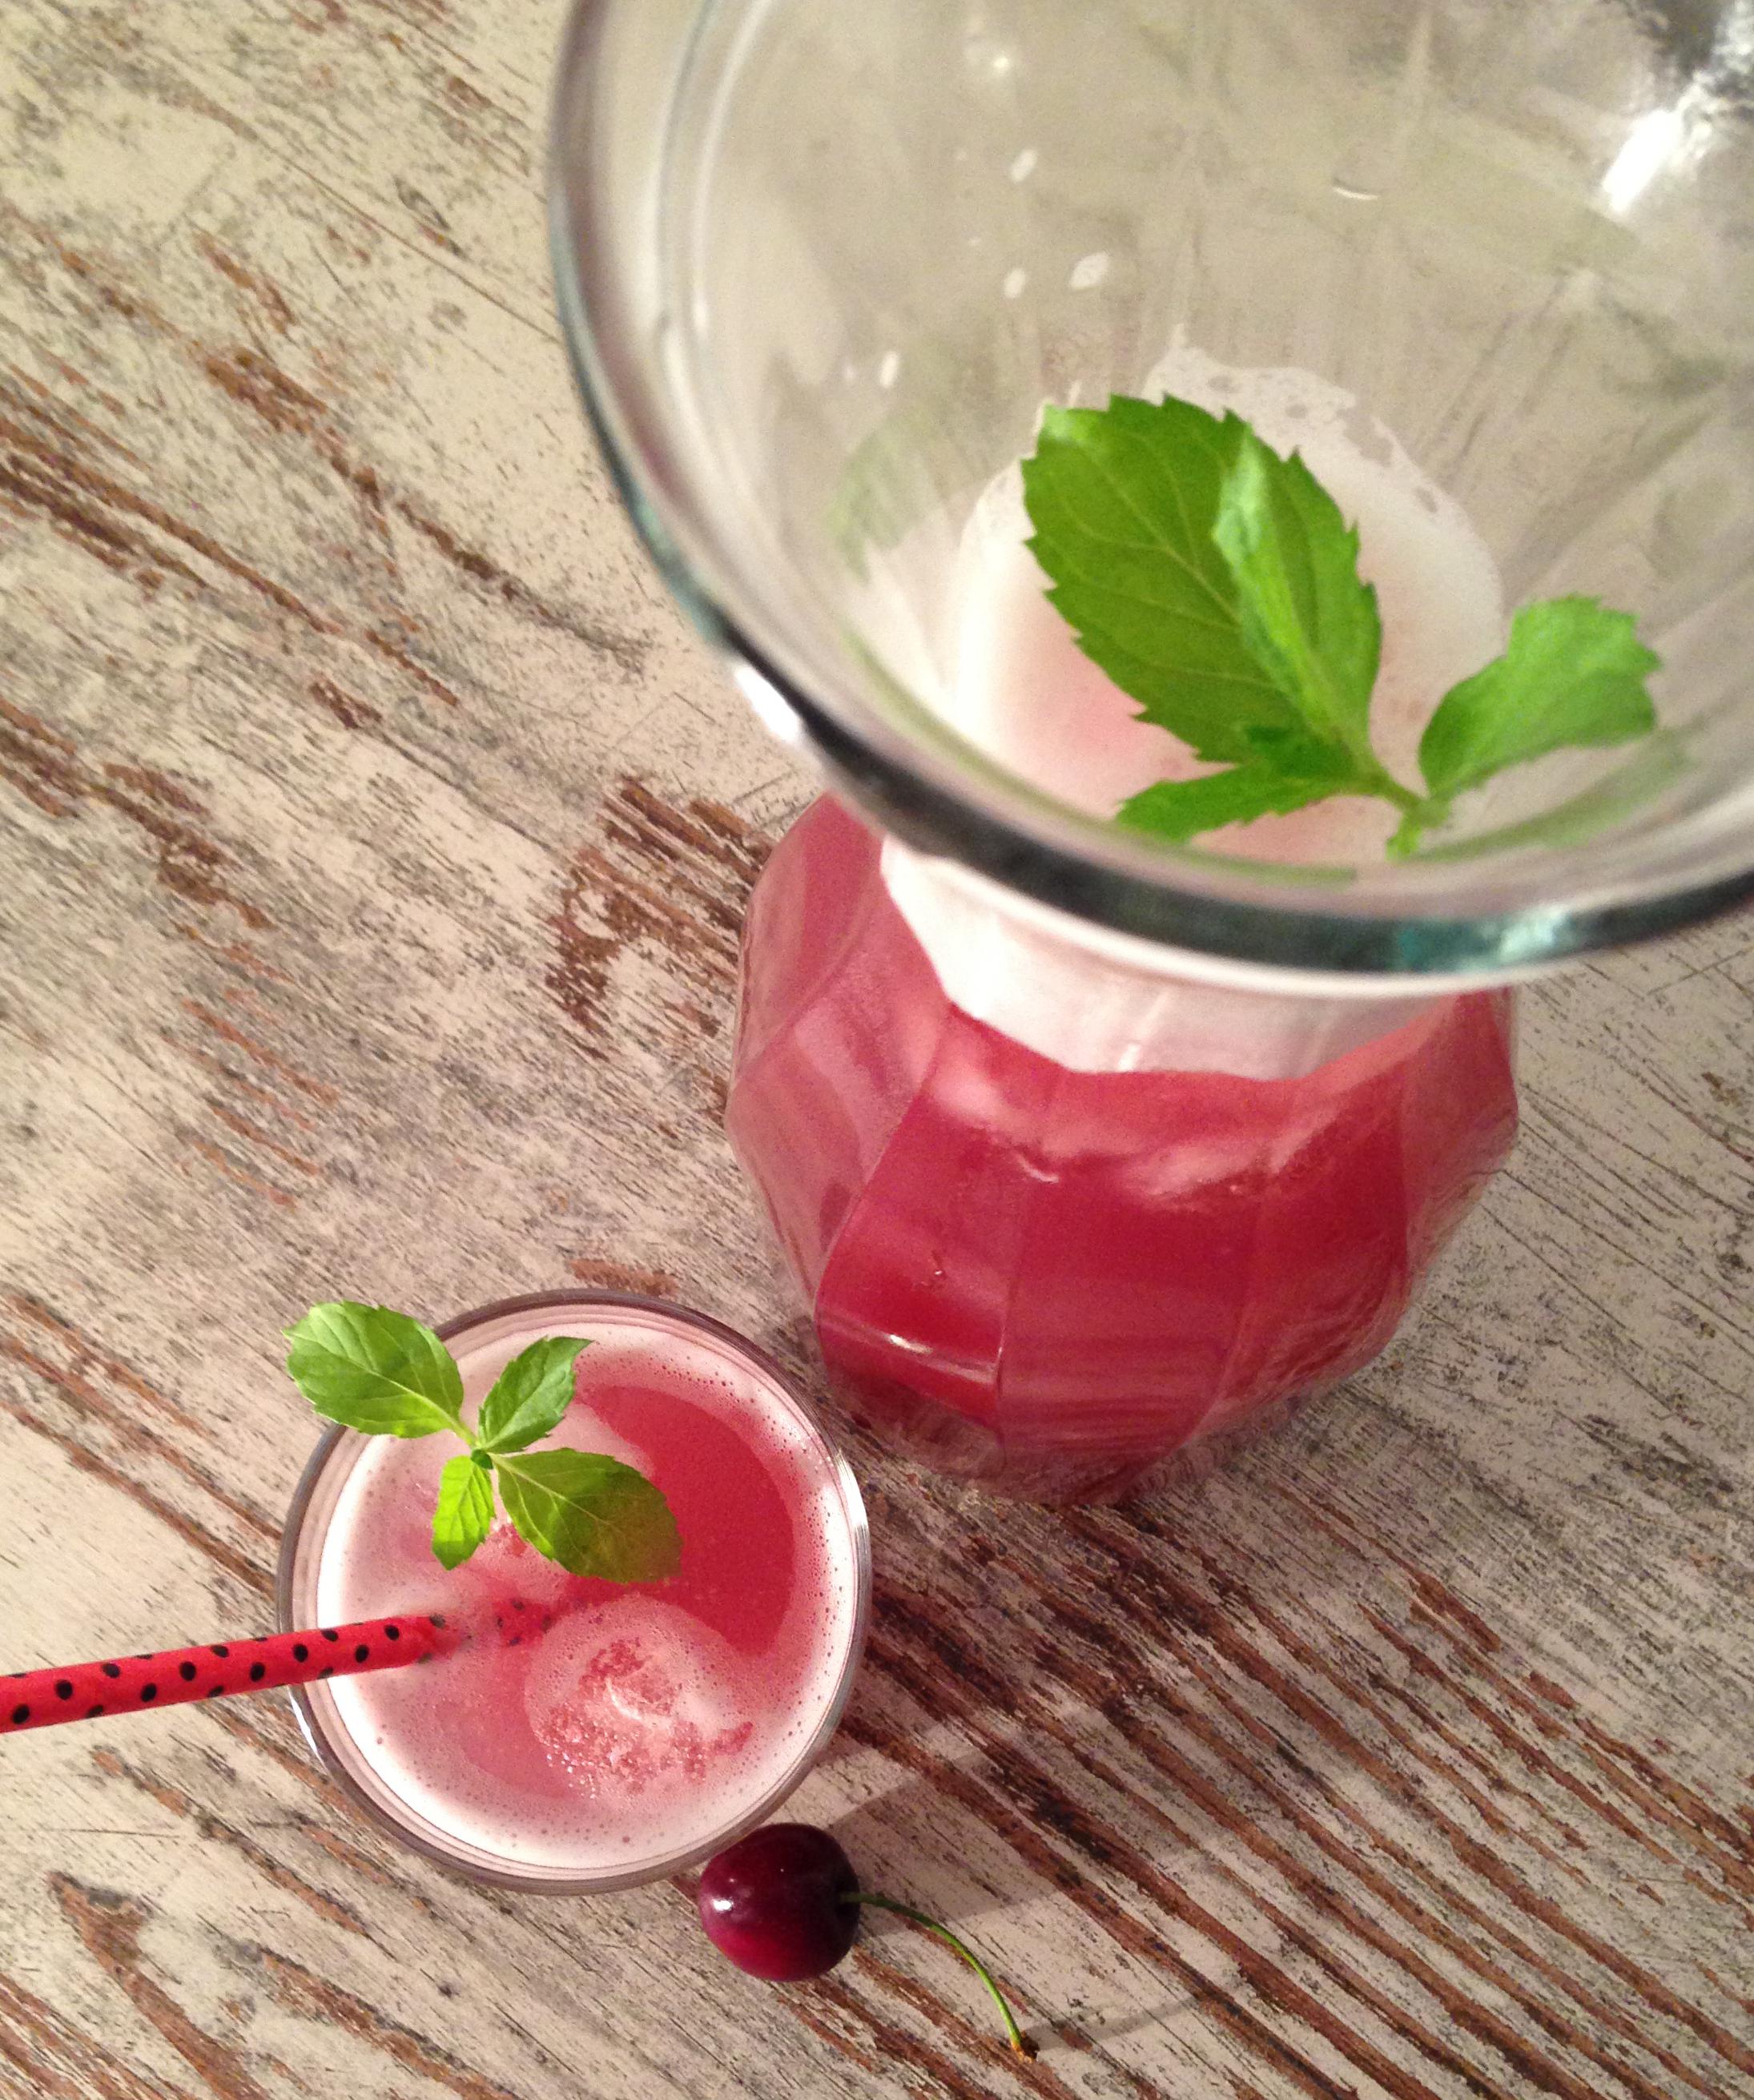 vanille-kirsch-limonade | vanilla-cherry-lemonade | vegan | vegetarian | vegetaisch | summerdrink